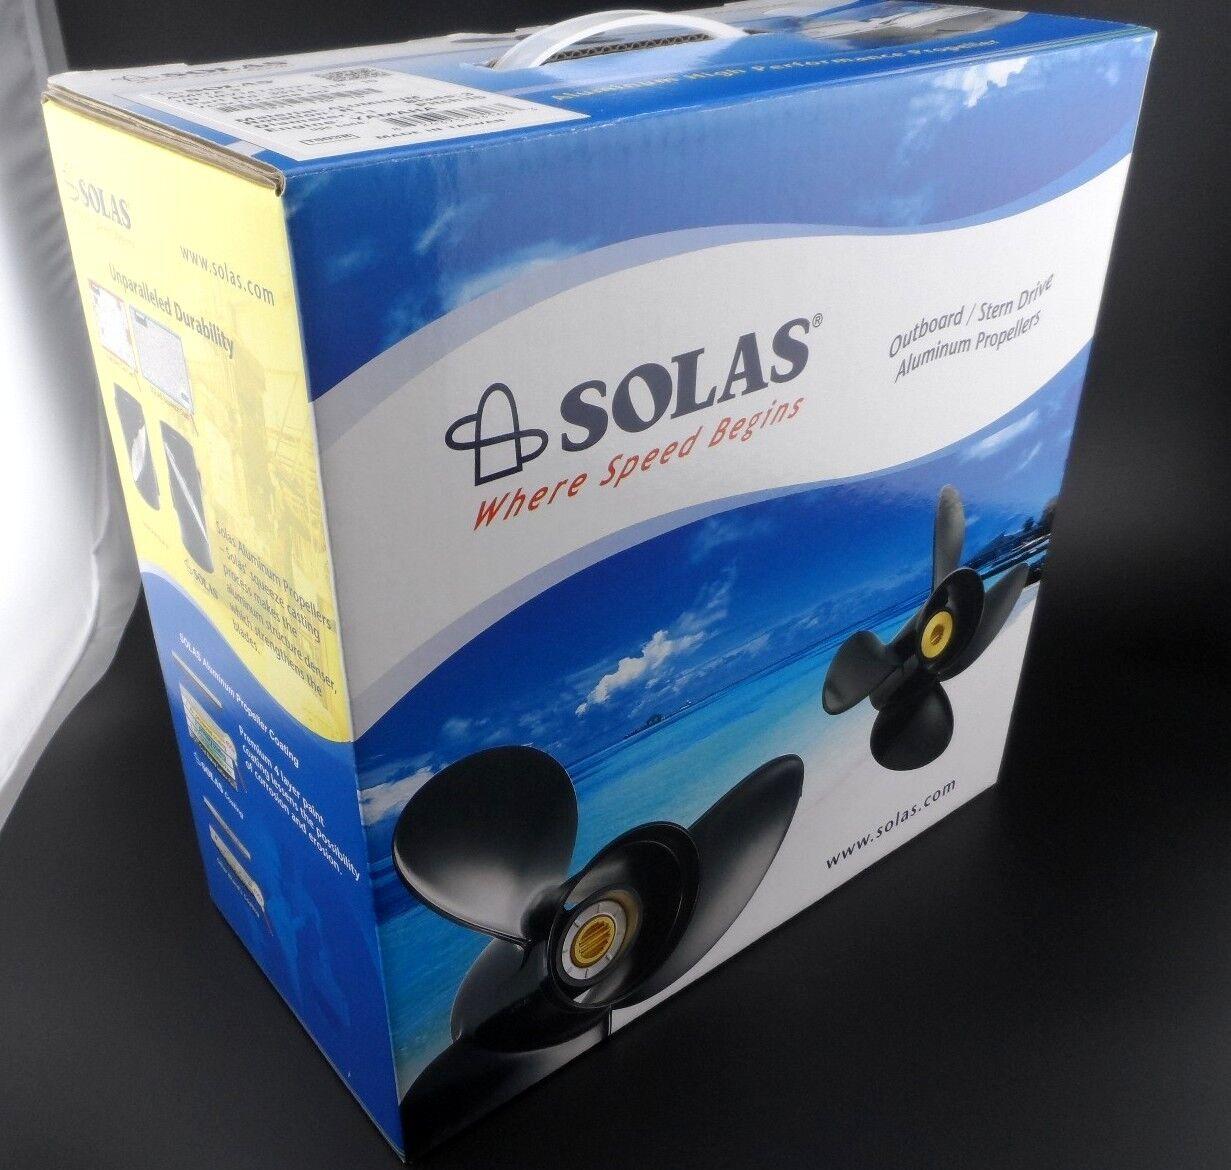 Solas Amita 3 Propeller for MERCURY /& TOHATSU Outboard 5111-093-09 3X9 1//4X9